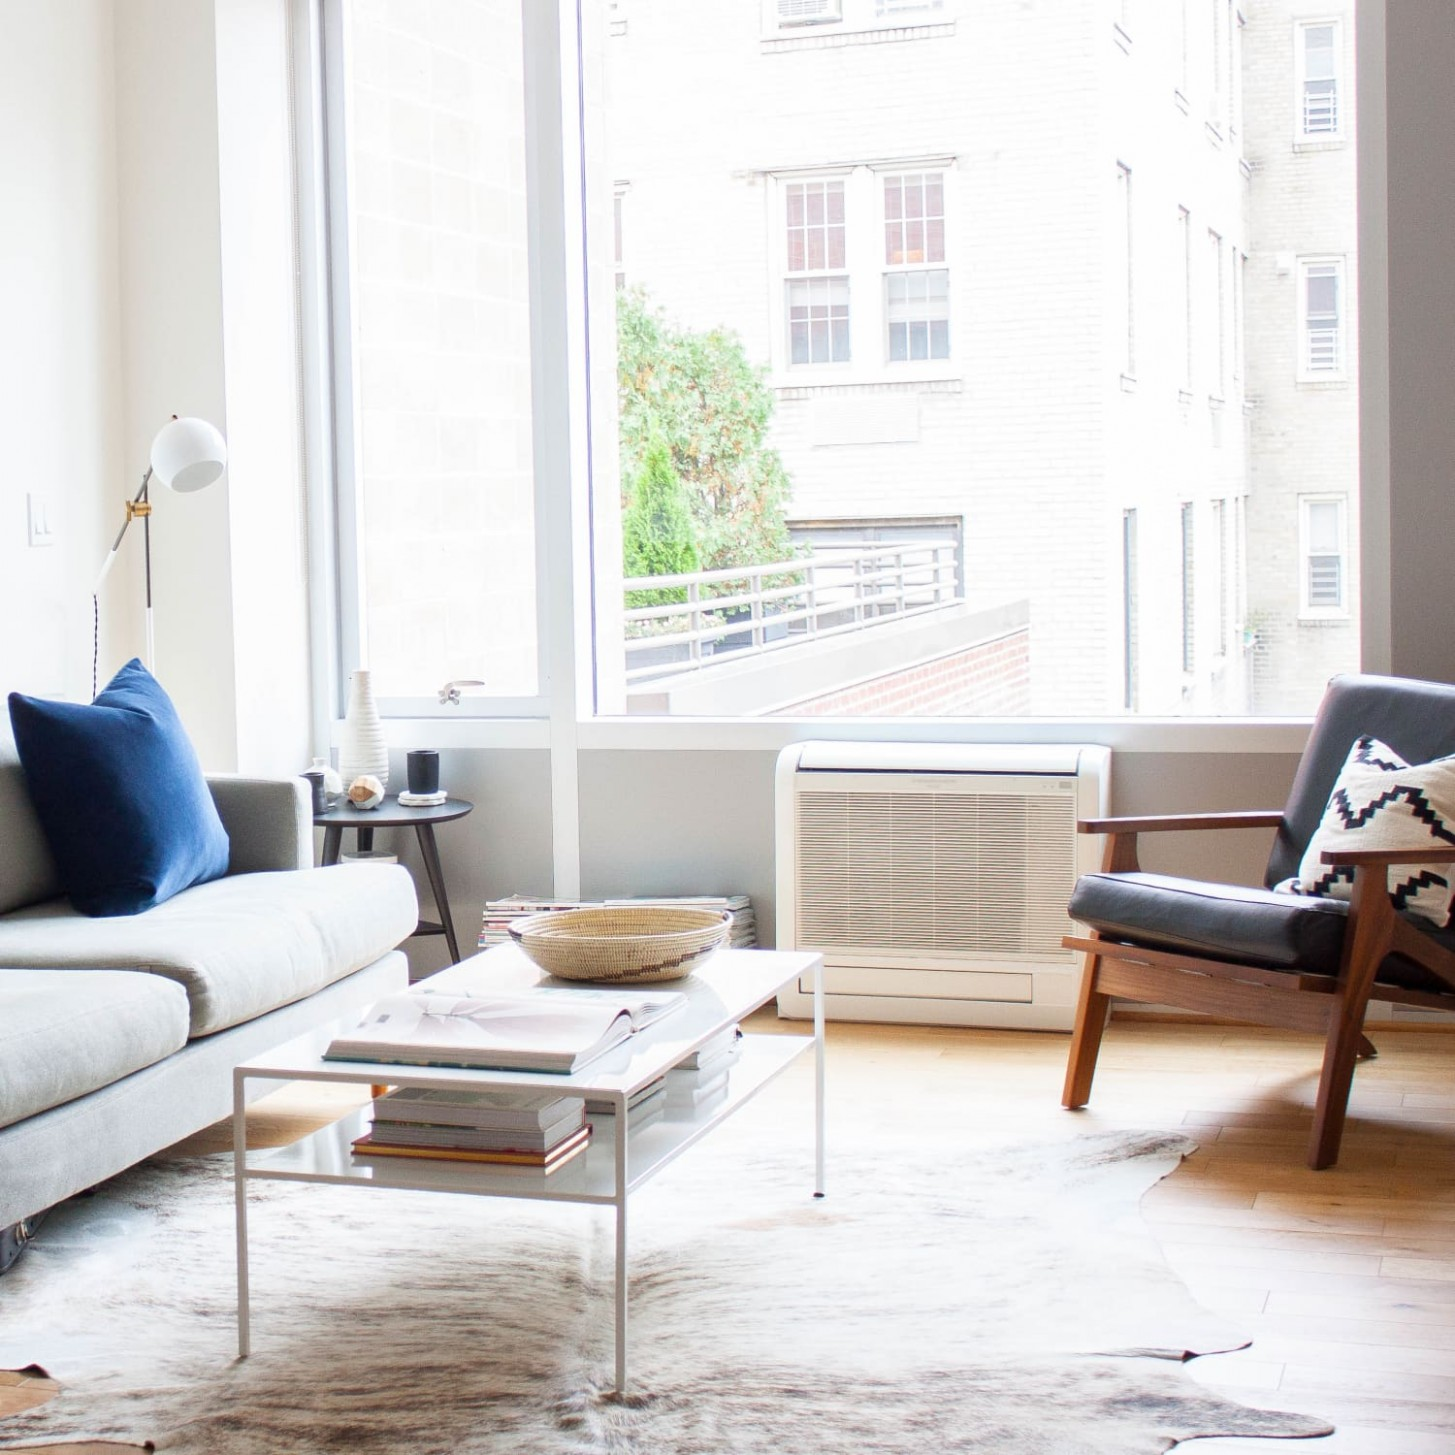 10 Small Living Room Decorating & Design Ideas - How to Decorate a  - Apartment Living Room Decor Ideas